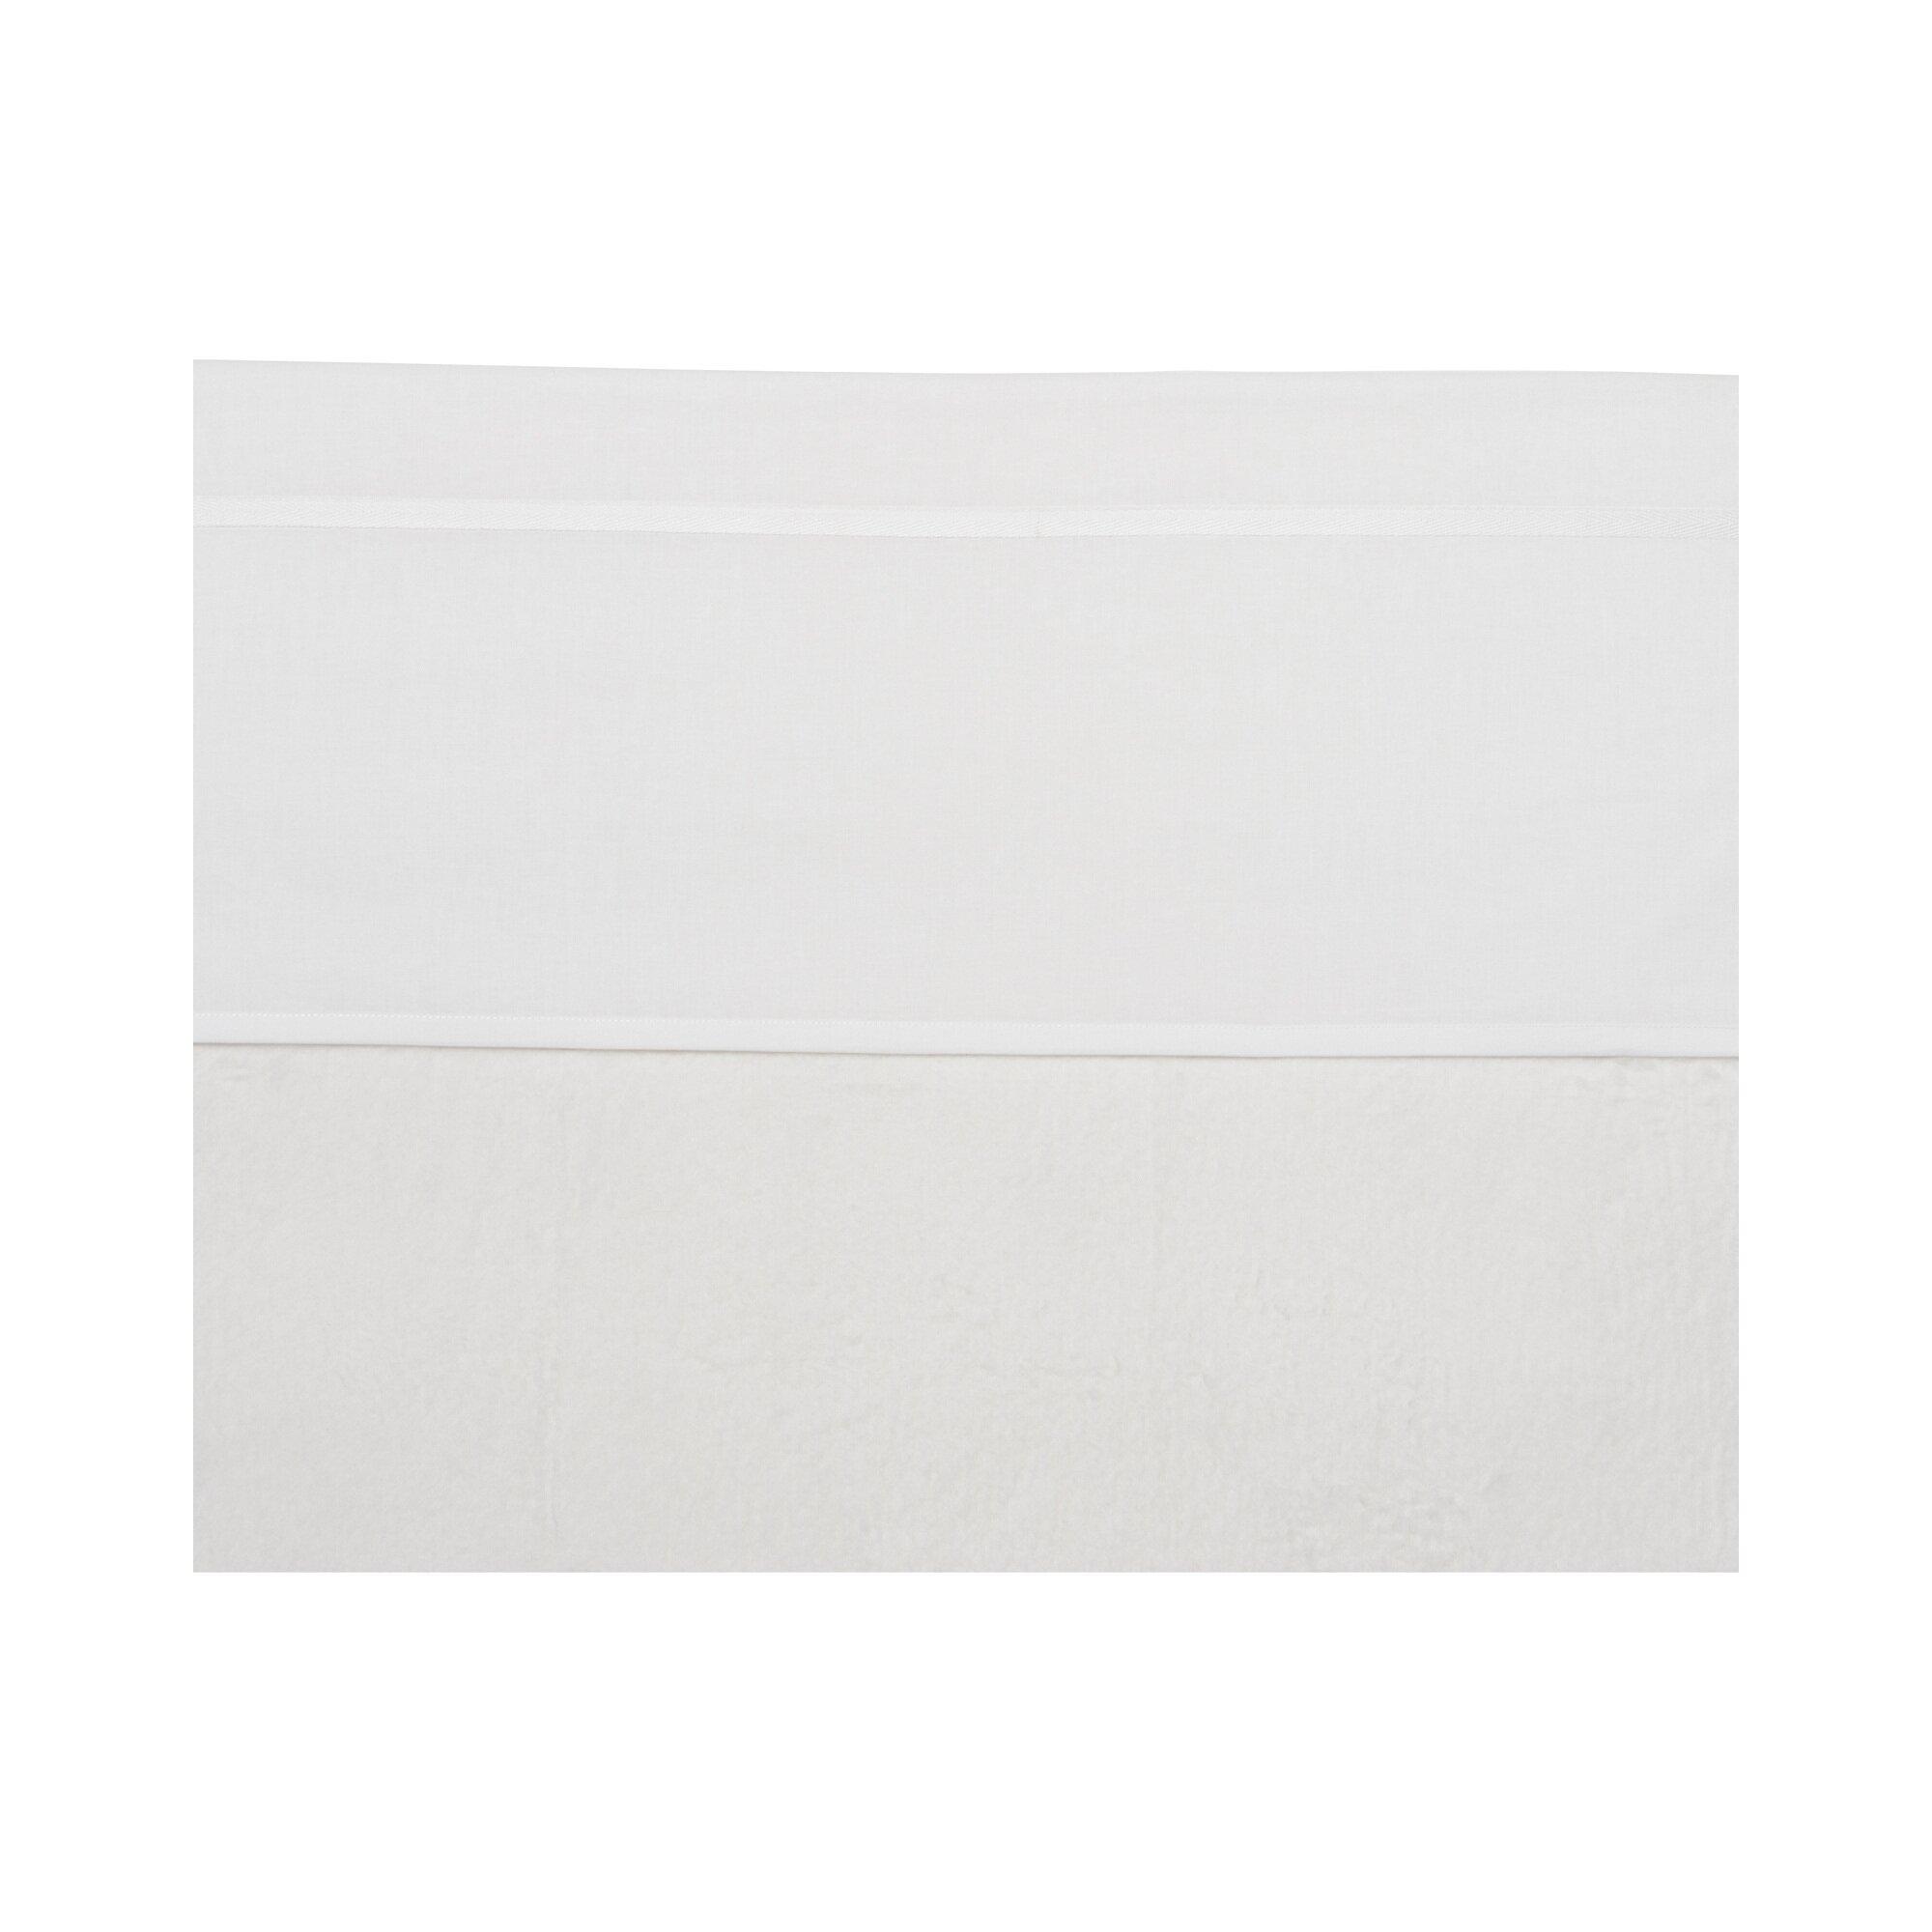 meyco-bettlaken-biesen-75x100-cm